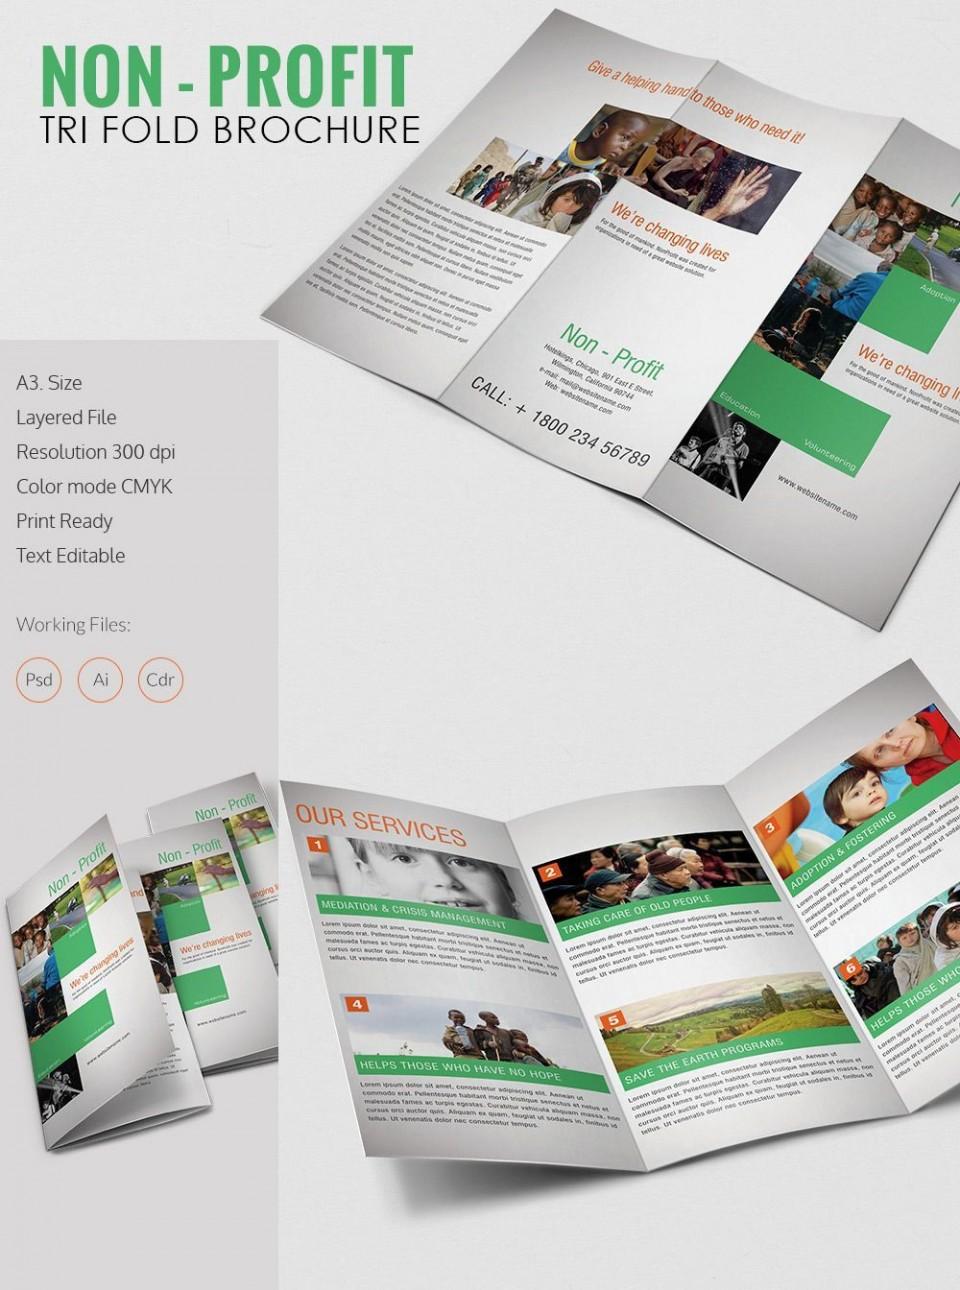 002 Stirring Indesign Trifold Brochure Template Photo  Tri Fold A4 Bi Free Download960